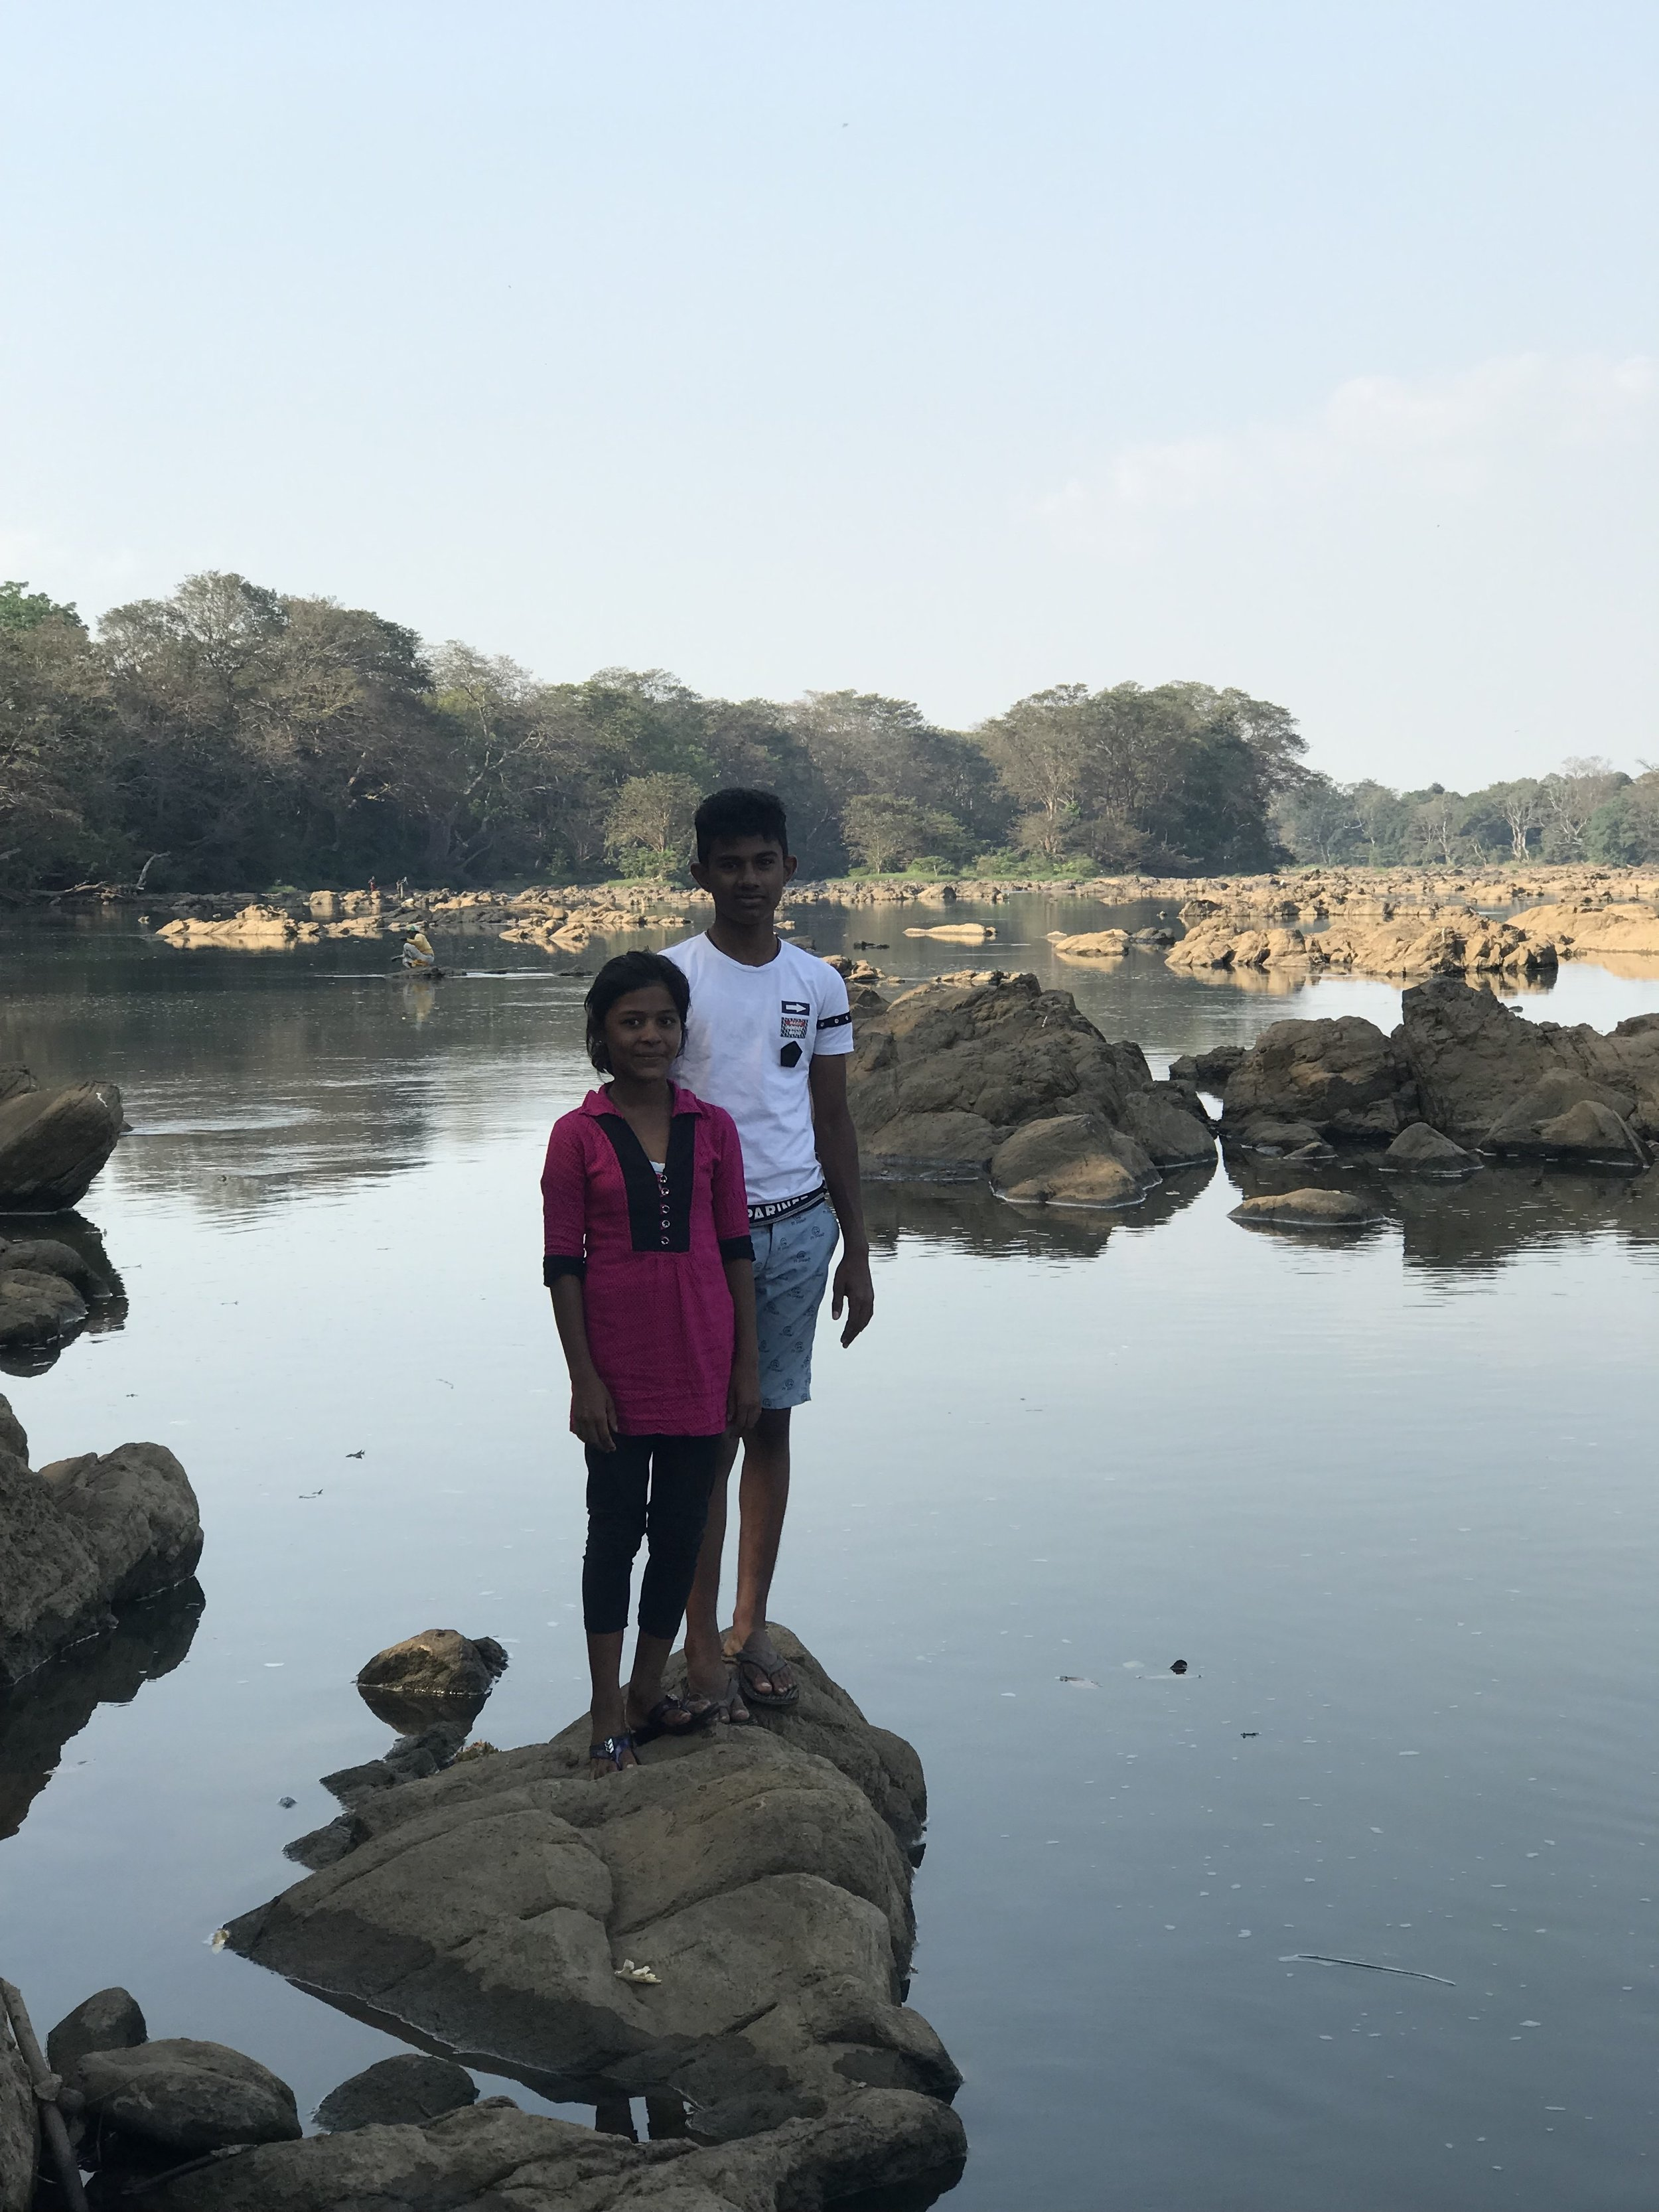 Siblings Moksha and Nimesh by the river where we stayed in the Wasgamuwa bungalow.